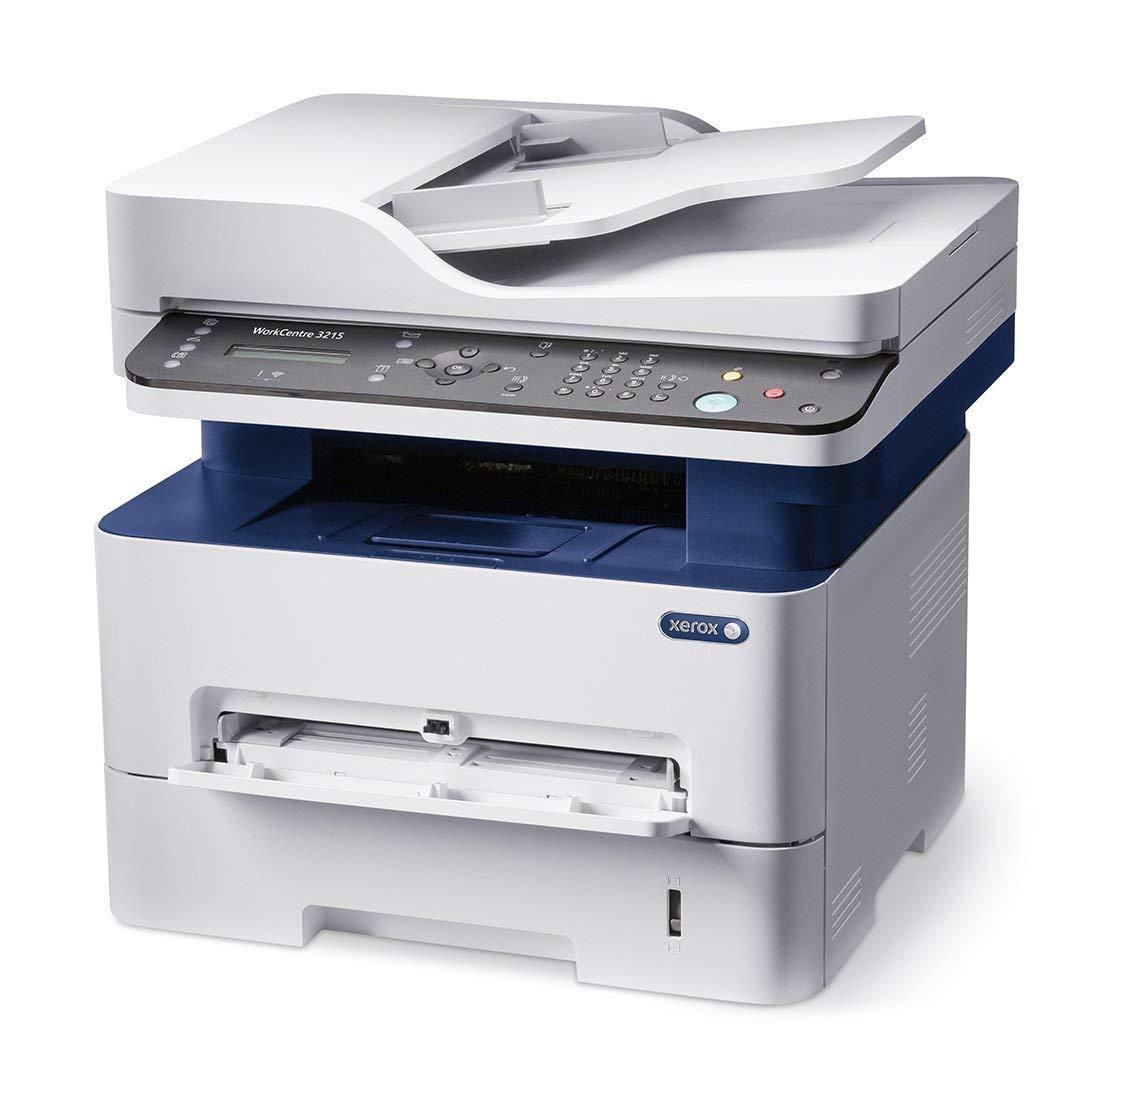 Xerox WorkCentre 3215/NI Monochrome Multifunction Printer (Renewed) by Xerox (Image #3)